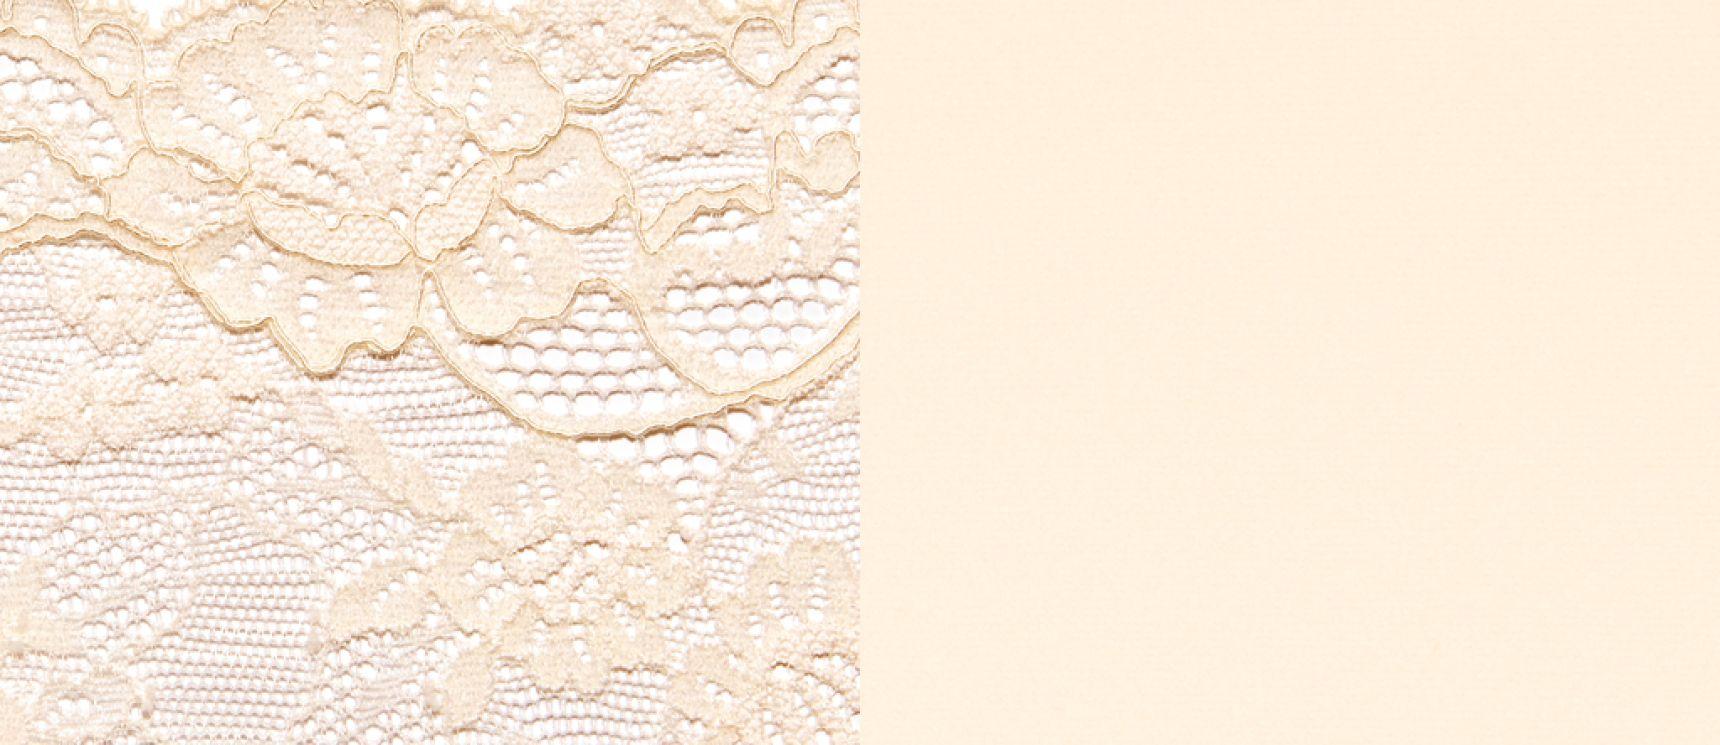 Madelon topattu pisaramalli Pearled Ivory